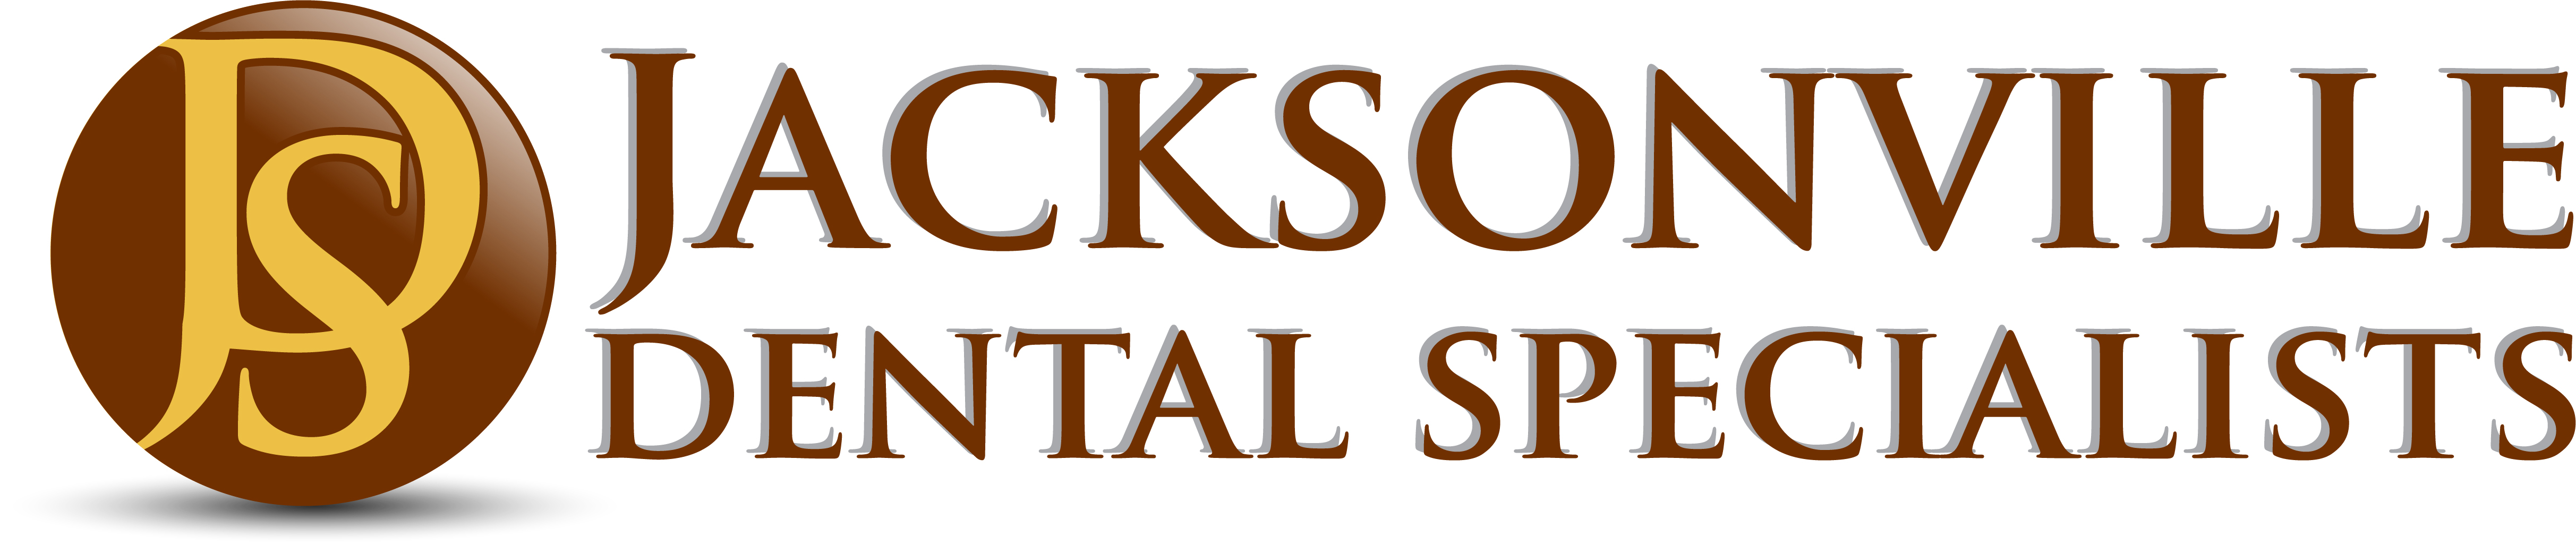 Jacksonville Dental Specialists